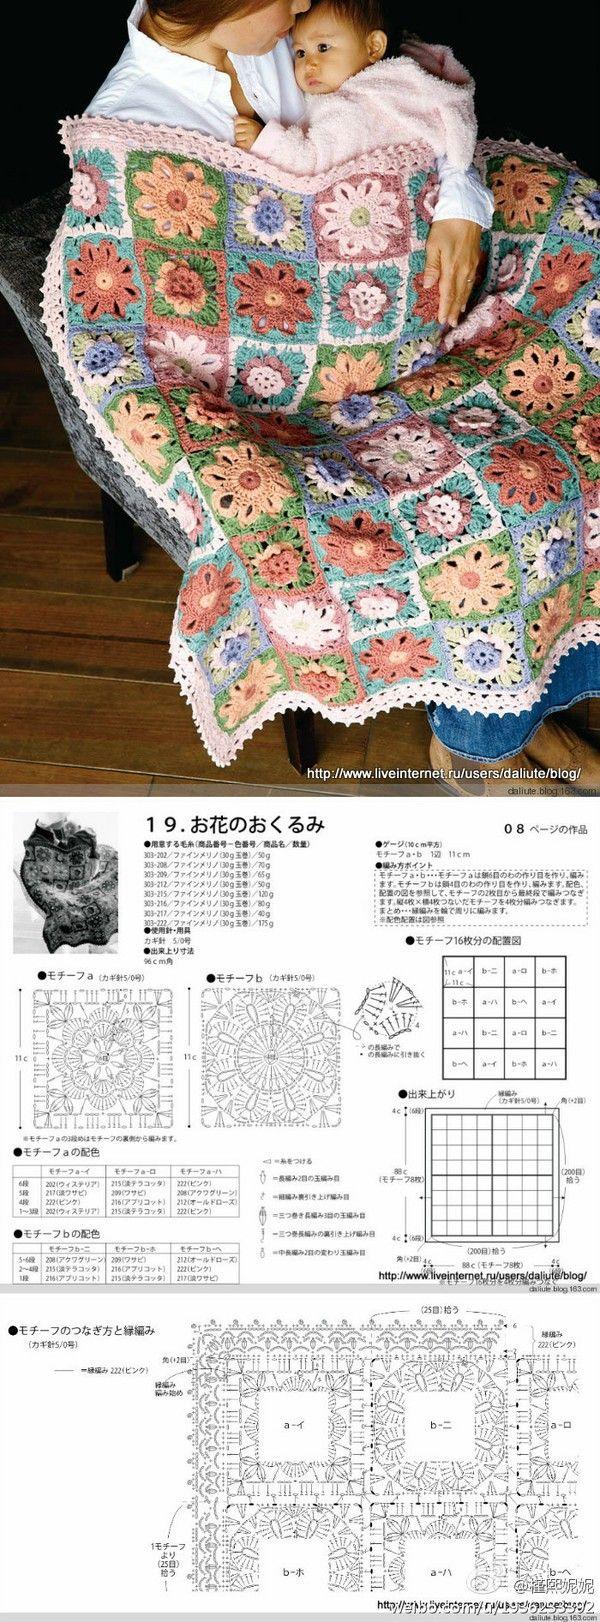 Crotchet Baby Blanket Pattern